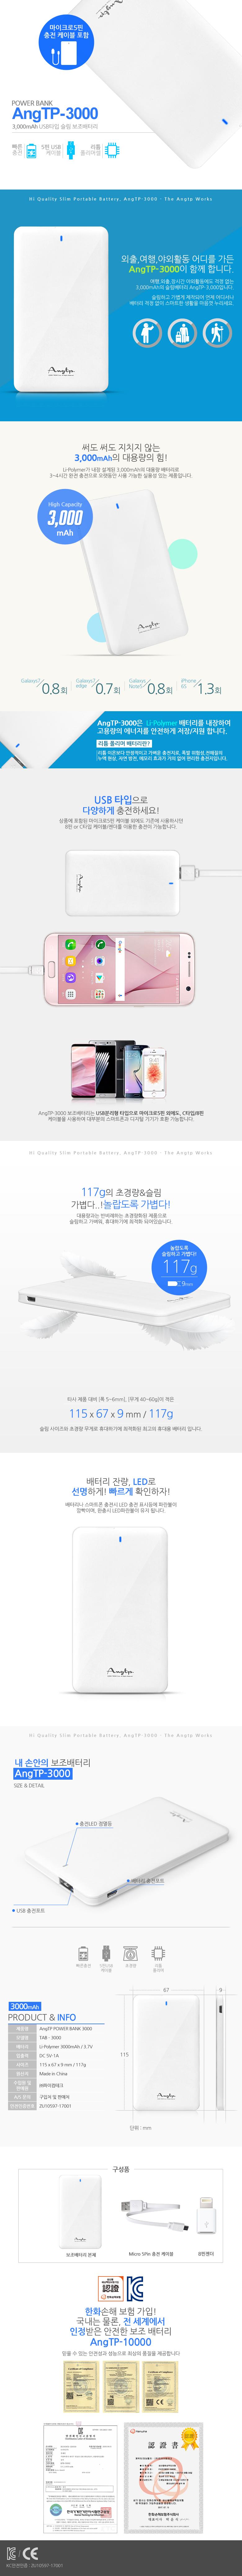 ANG  초미니 보조배터리 3000mAh USB 5핀8핀 지원 - 셀탑코리아, 6,500원, 보조배터리, ~ 10600mAh